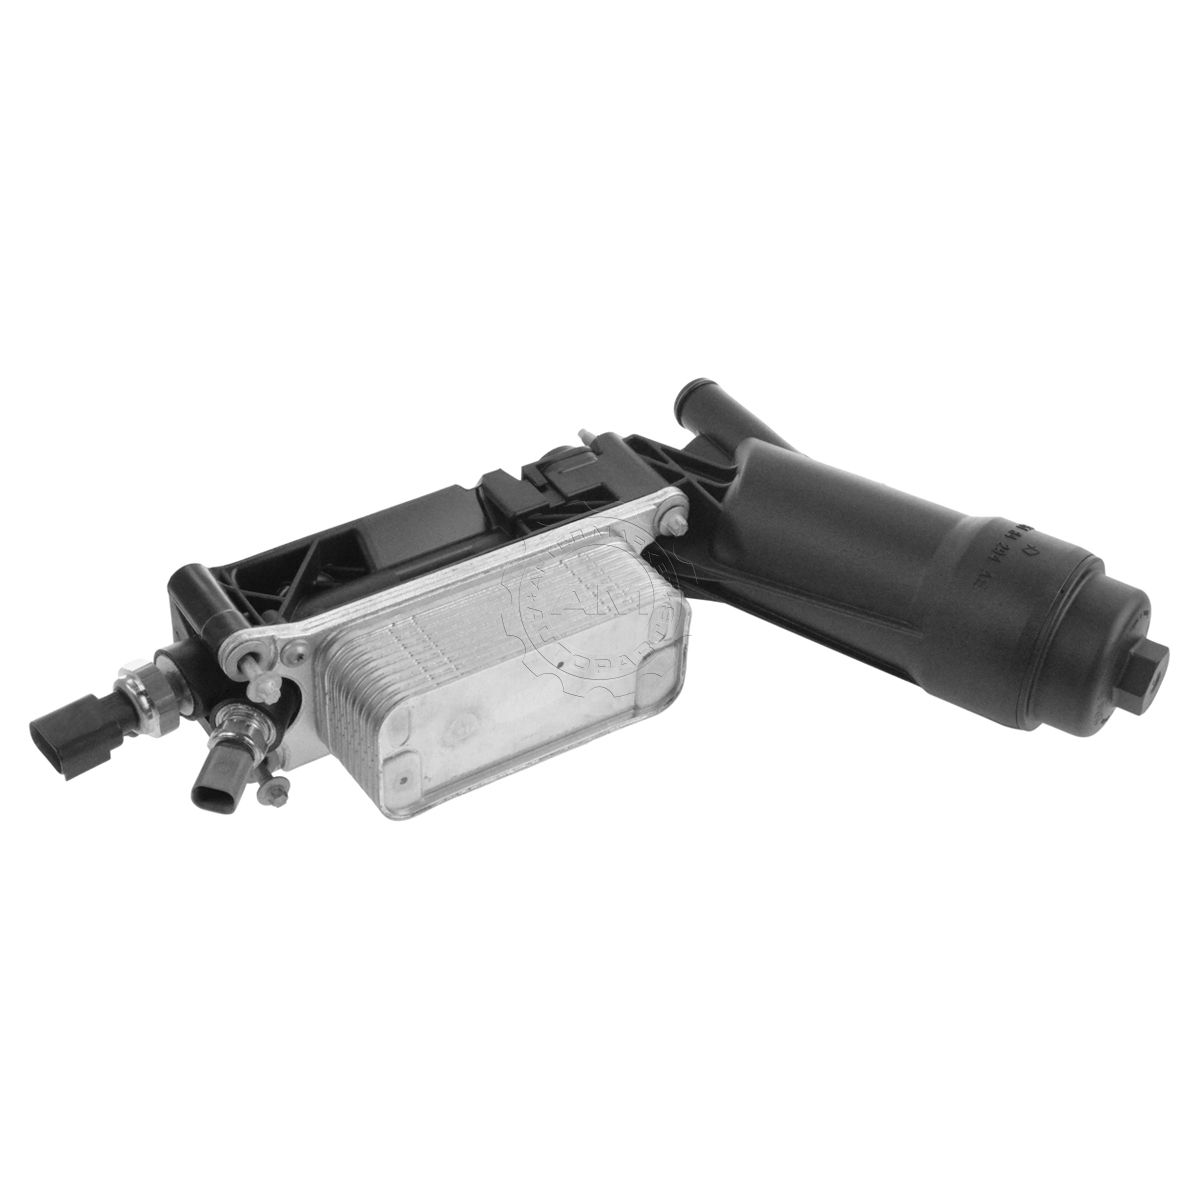 Oem 5184294ae Oil Filter Housing Amp Cooler Assembly For